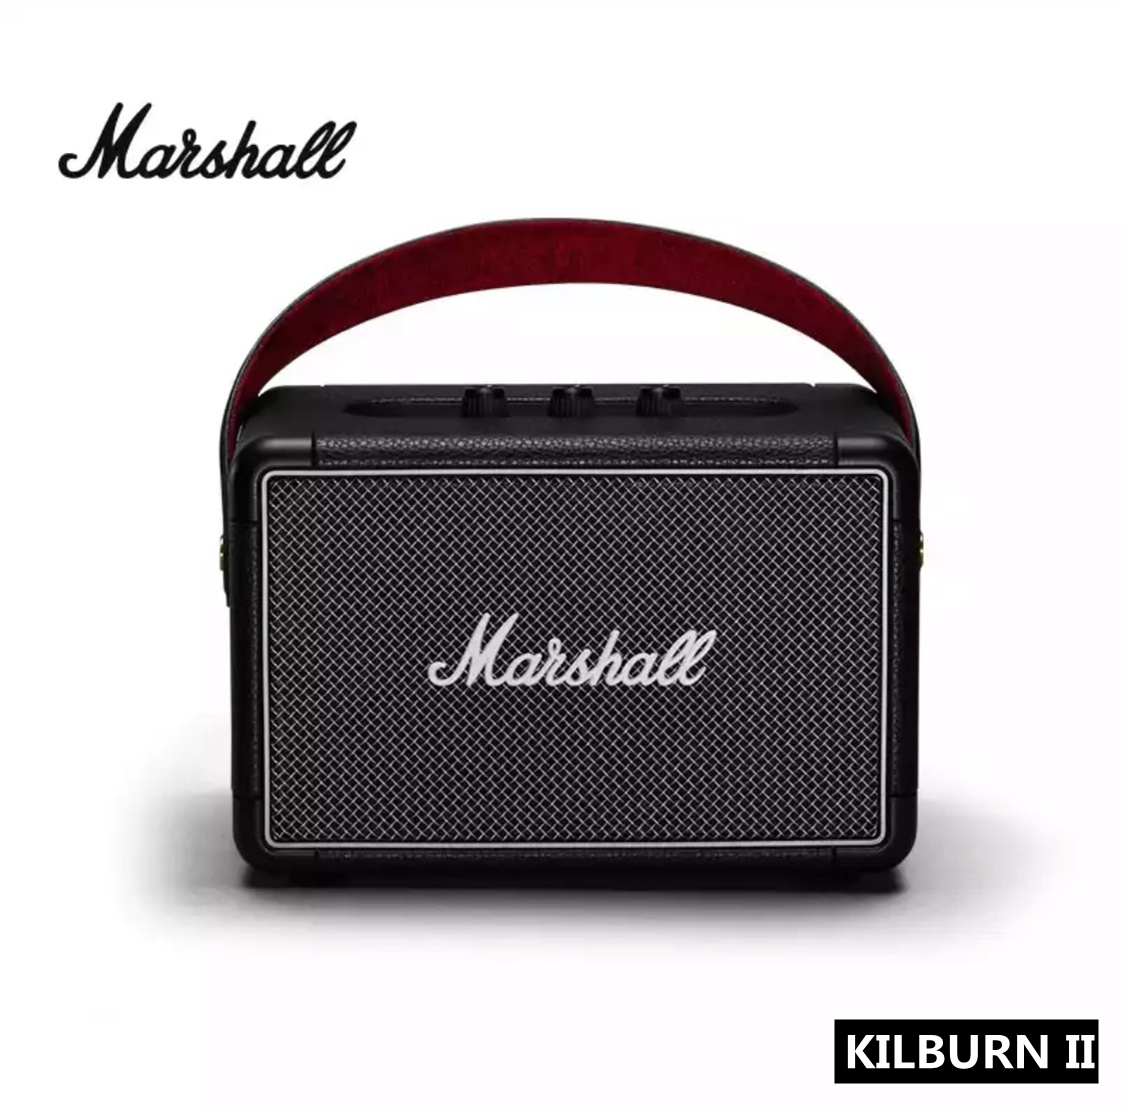 MARSHALL KILBURN II สีขาว - รับประกัน1 ปี + ส่งฟรีทั่วไทย (ลำโพงบลูทูธ, ลำโพงบ้าน, ลำโพงขนาดเ)